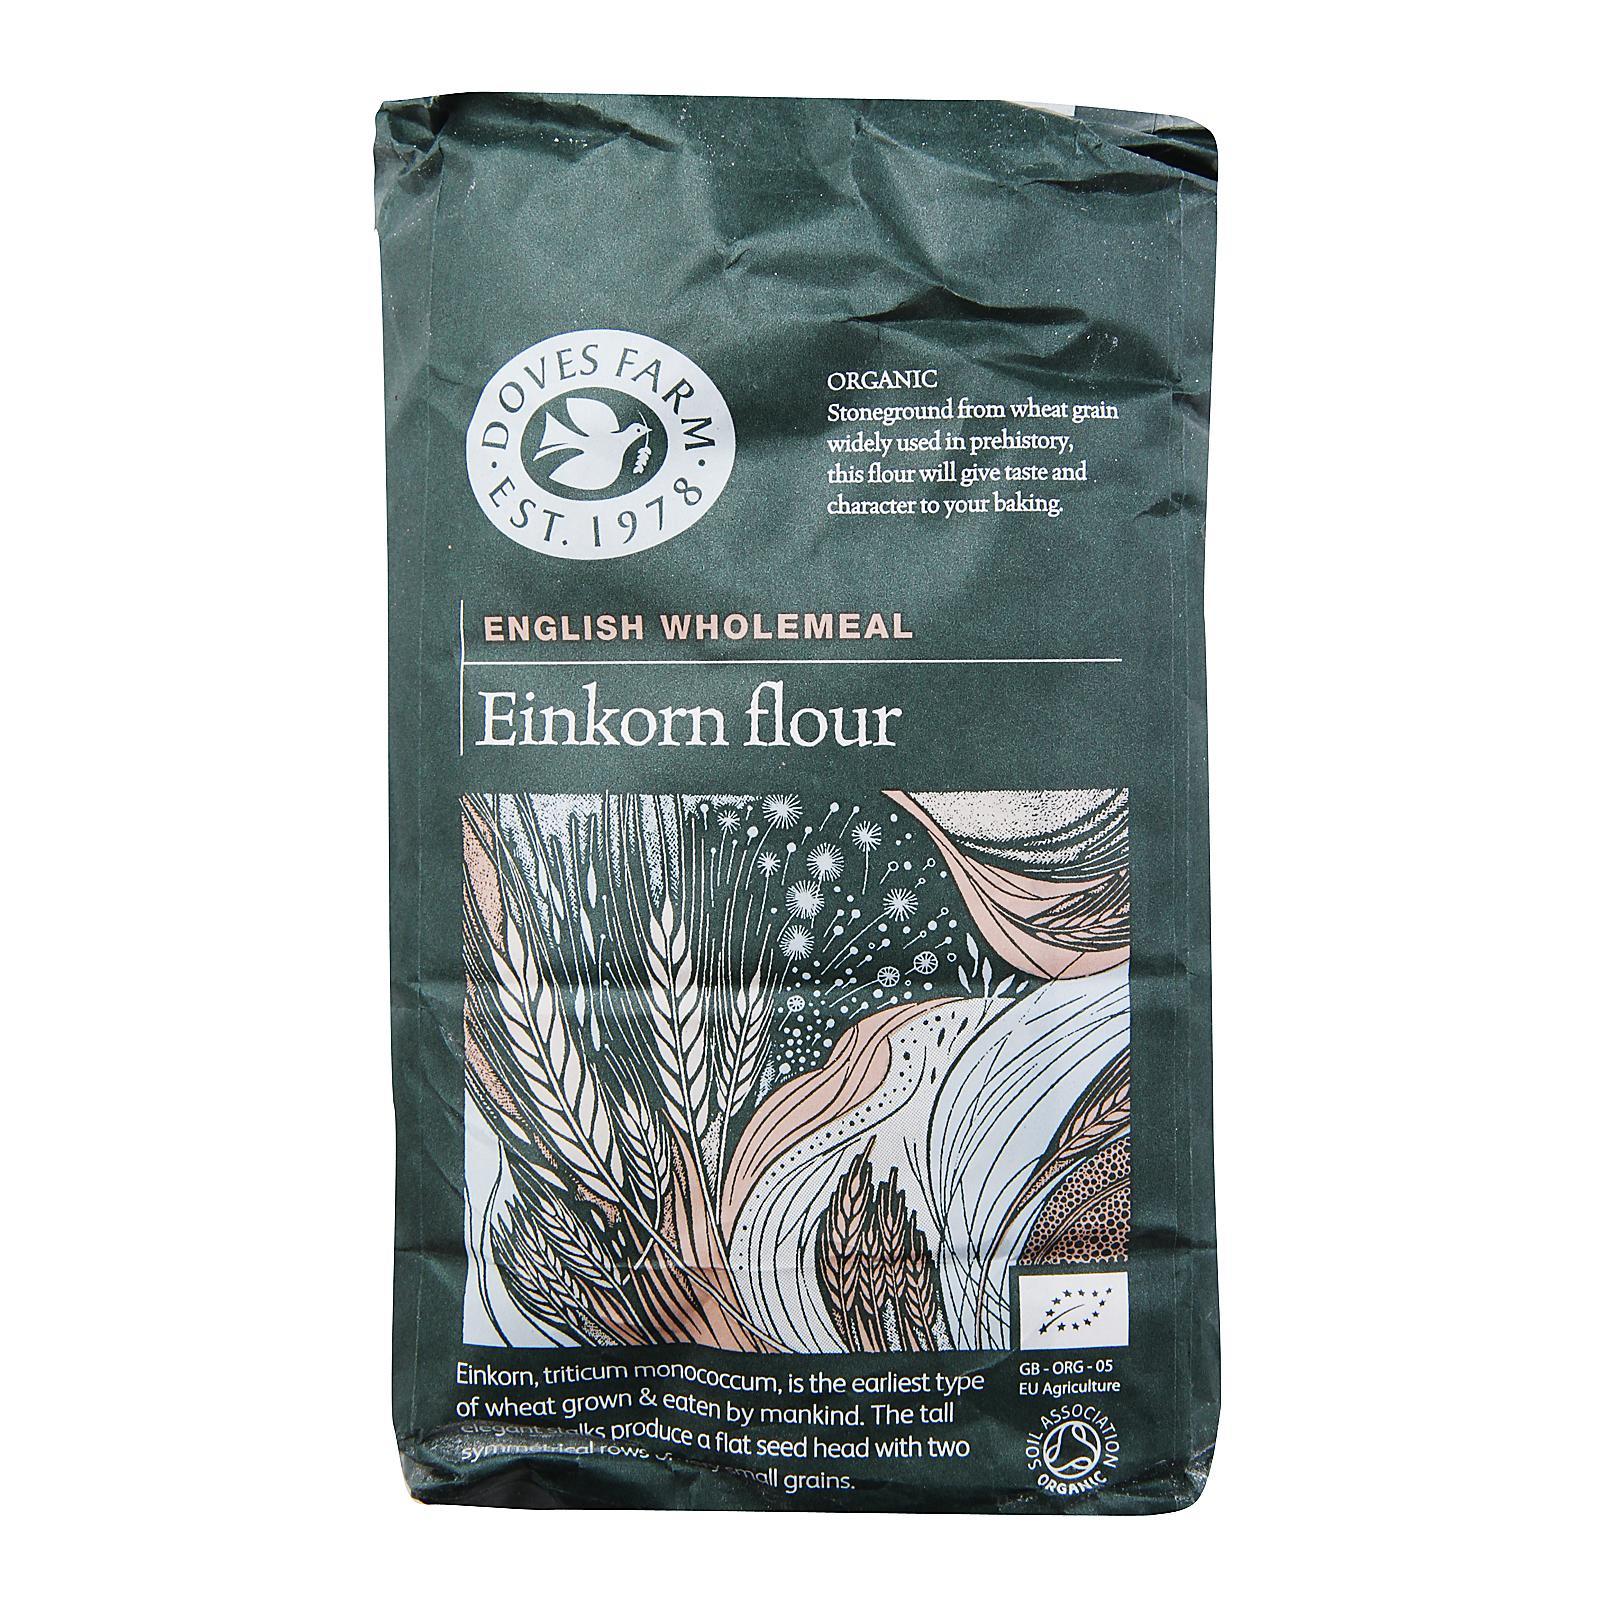 Doves Farm Organic English Wholemeal Einkorn Flour